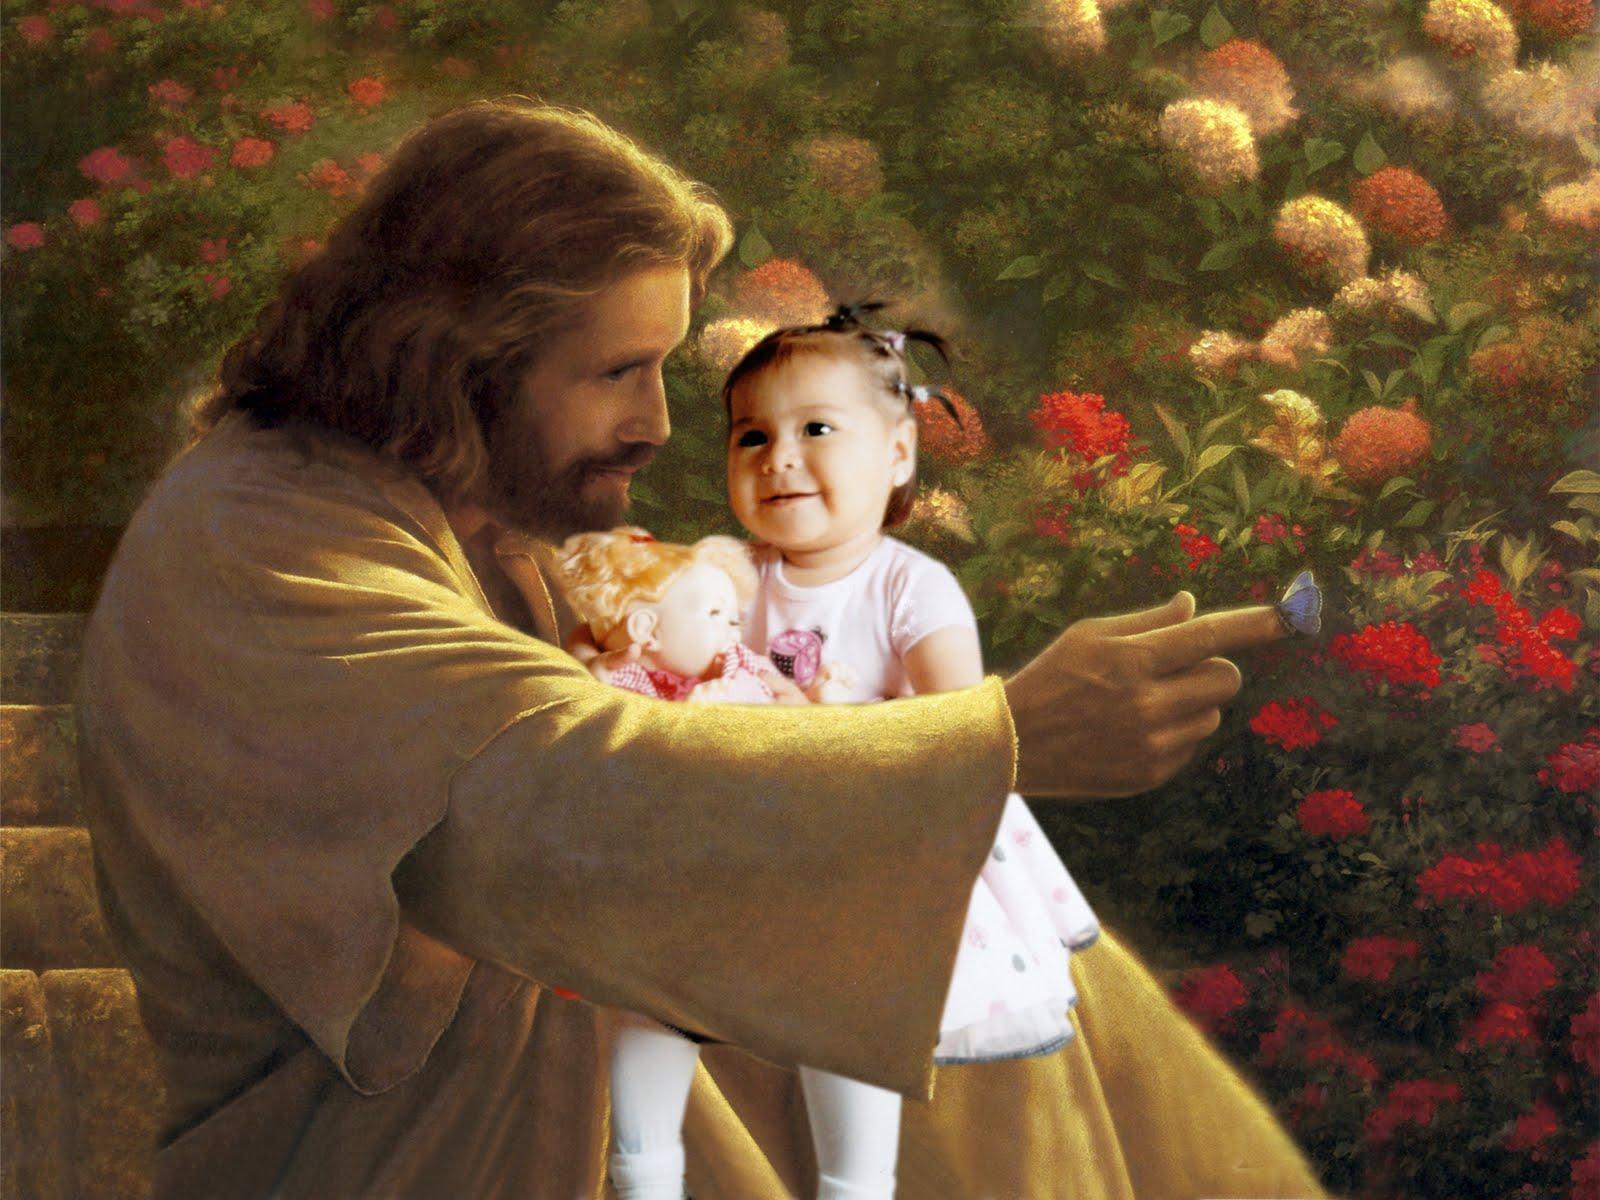 Fondos bautizo para photoshop gratis - Imagui